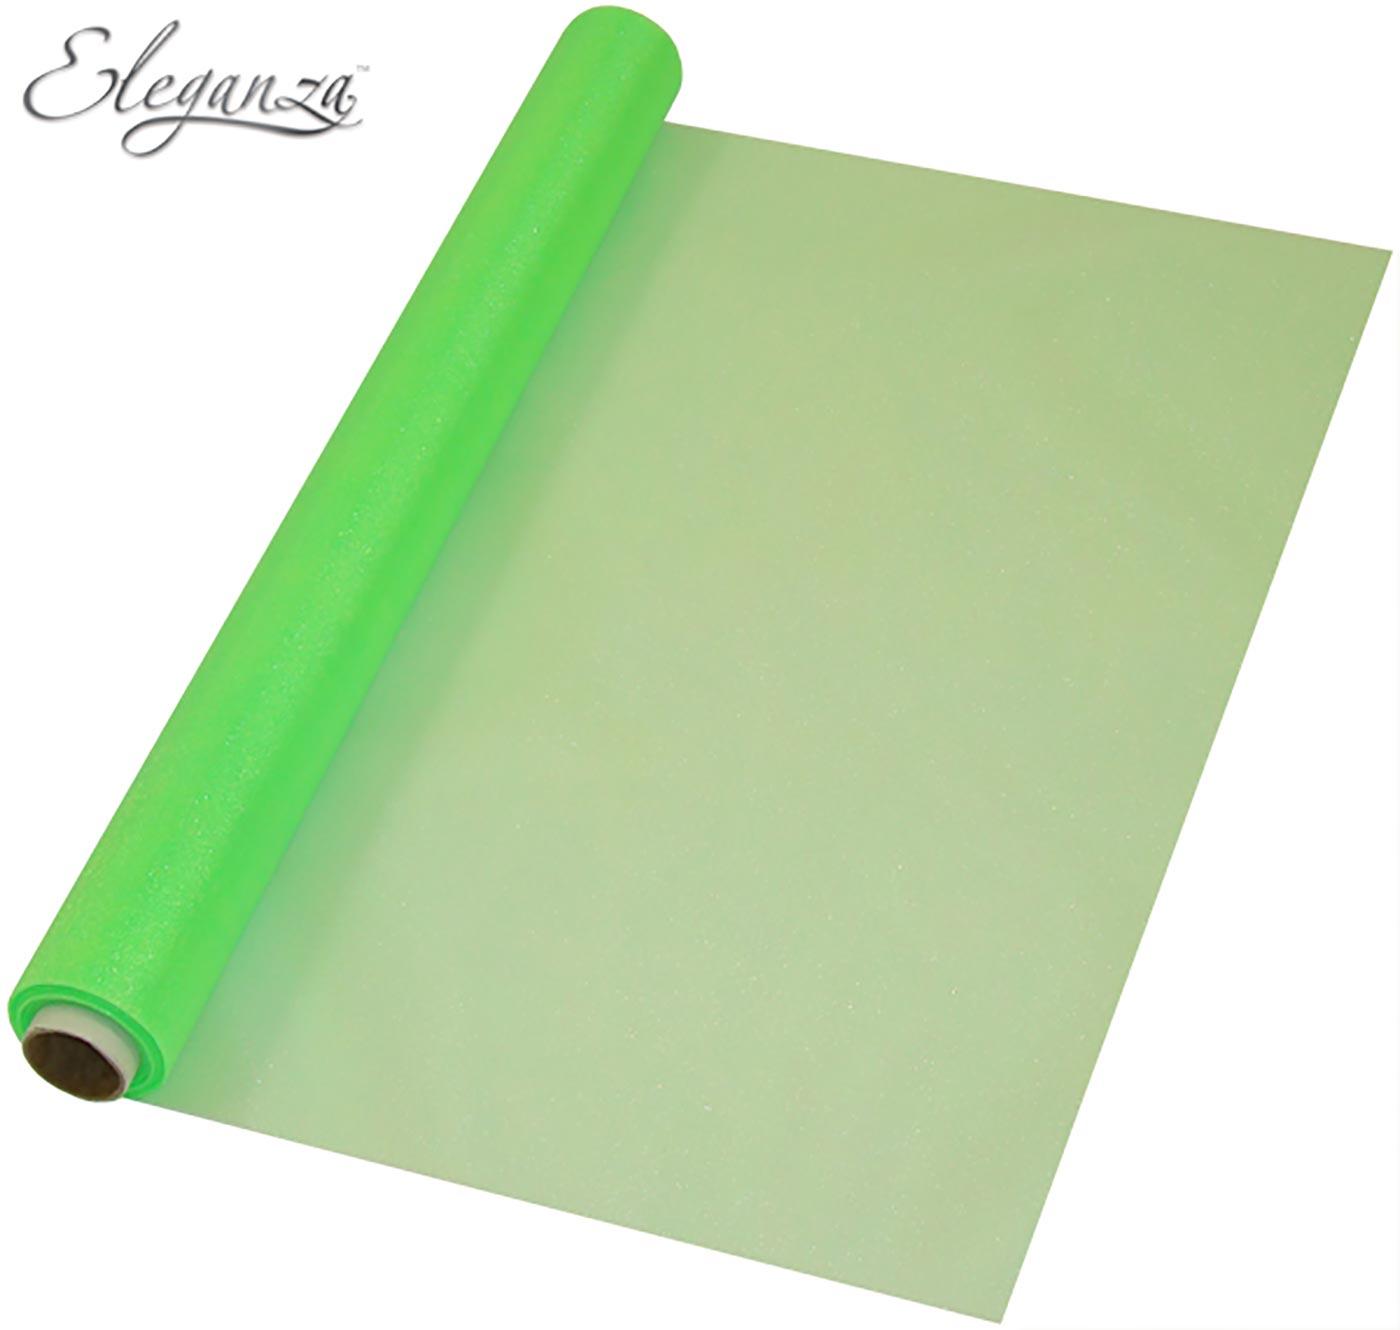 Eleganza Soft Sheer Organza 47cm x 10m No.14 Lime Green